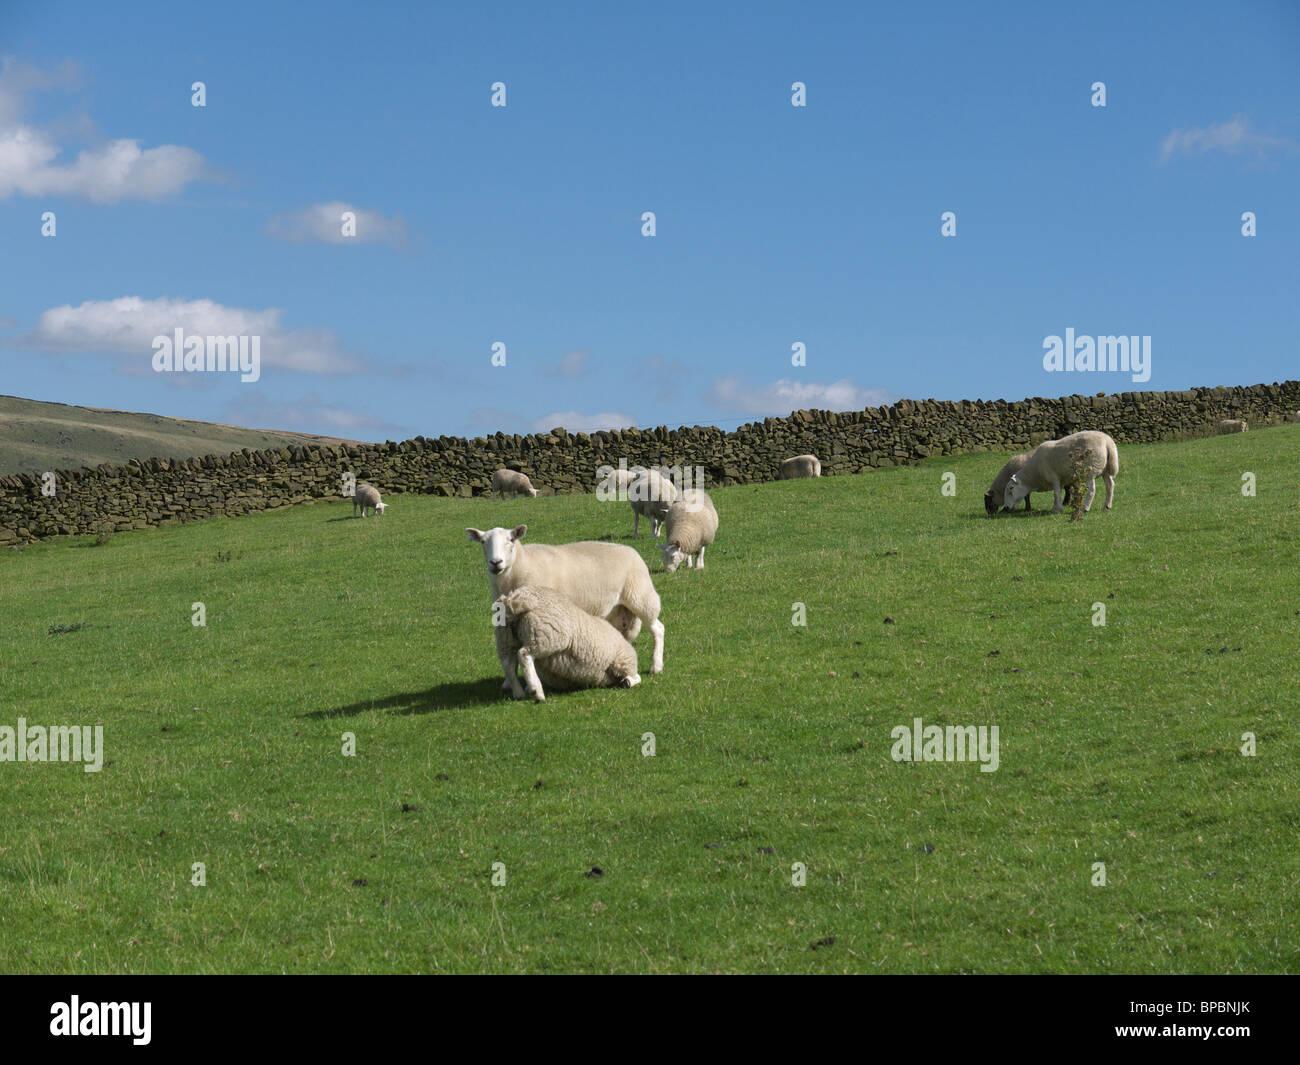 Ewe feeding a well grown lamb, Saddleworth, England,UK. - Stock Image